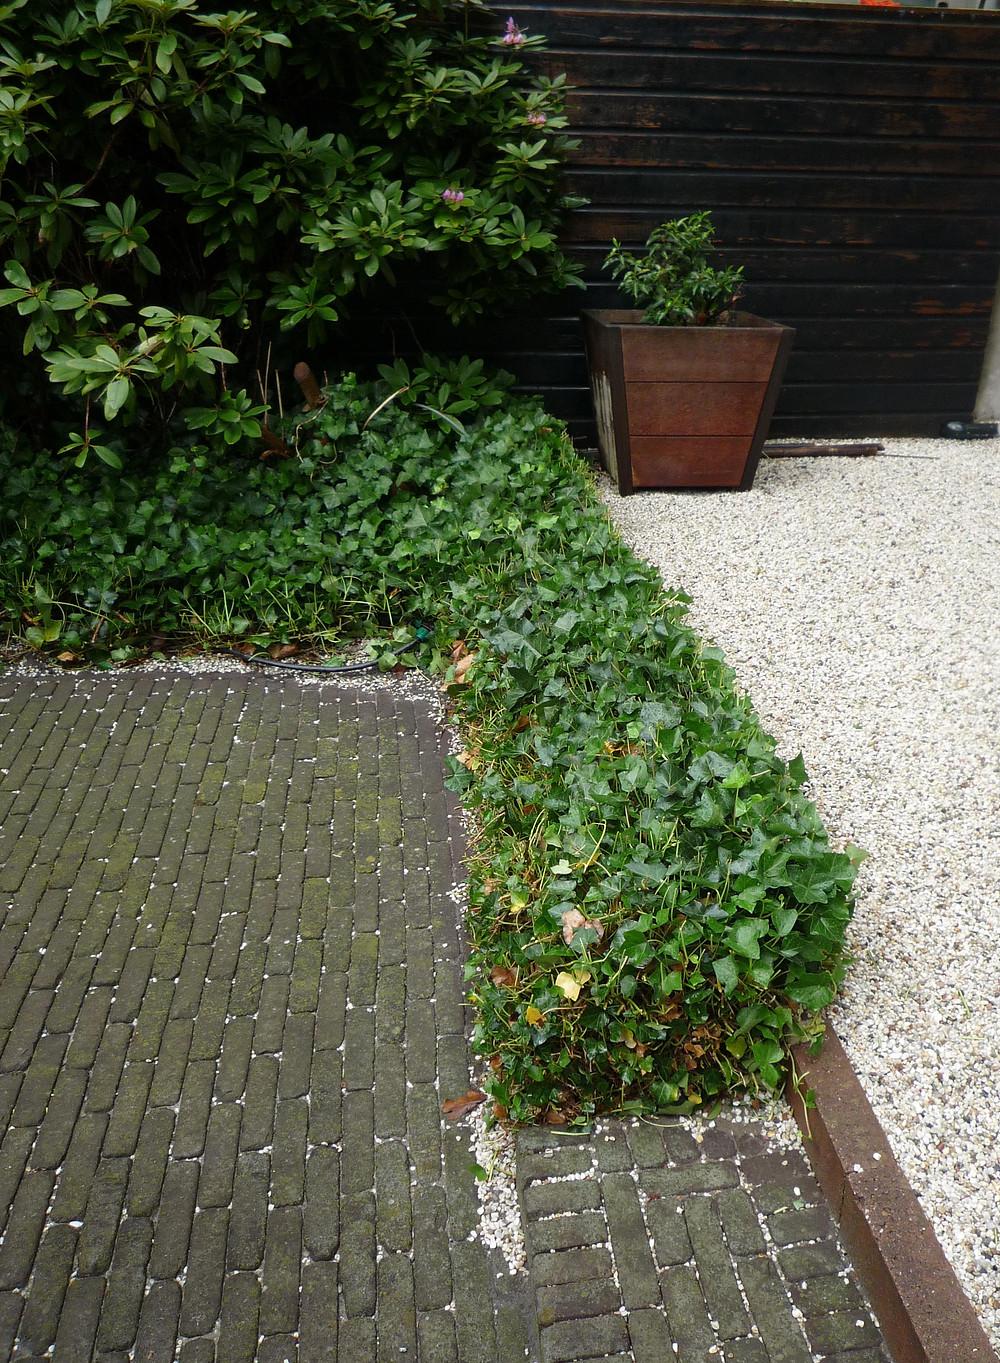 ivy edging, gravel, sett patio, brick patio, brick courtyard,